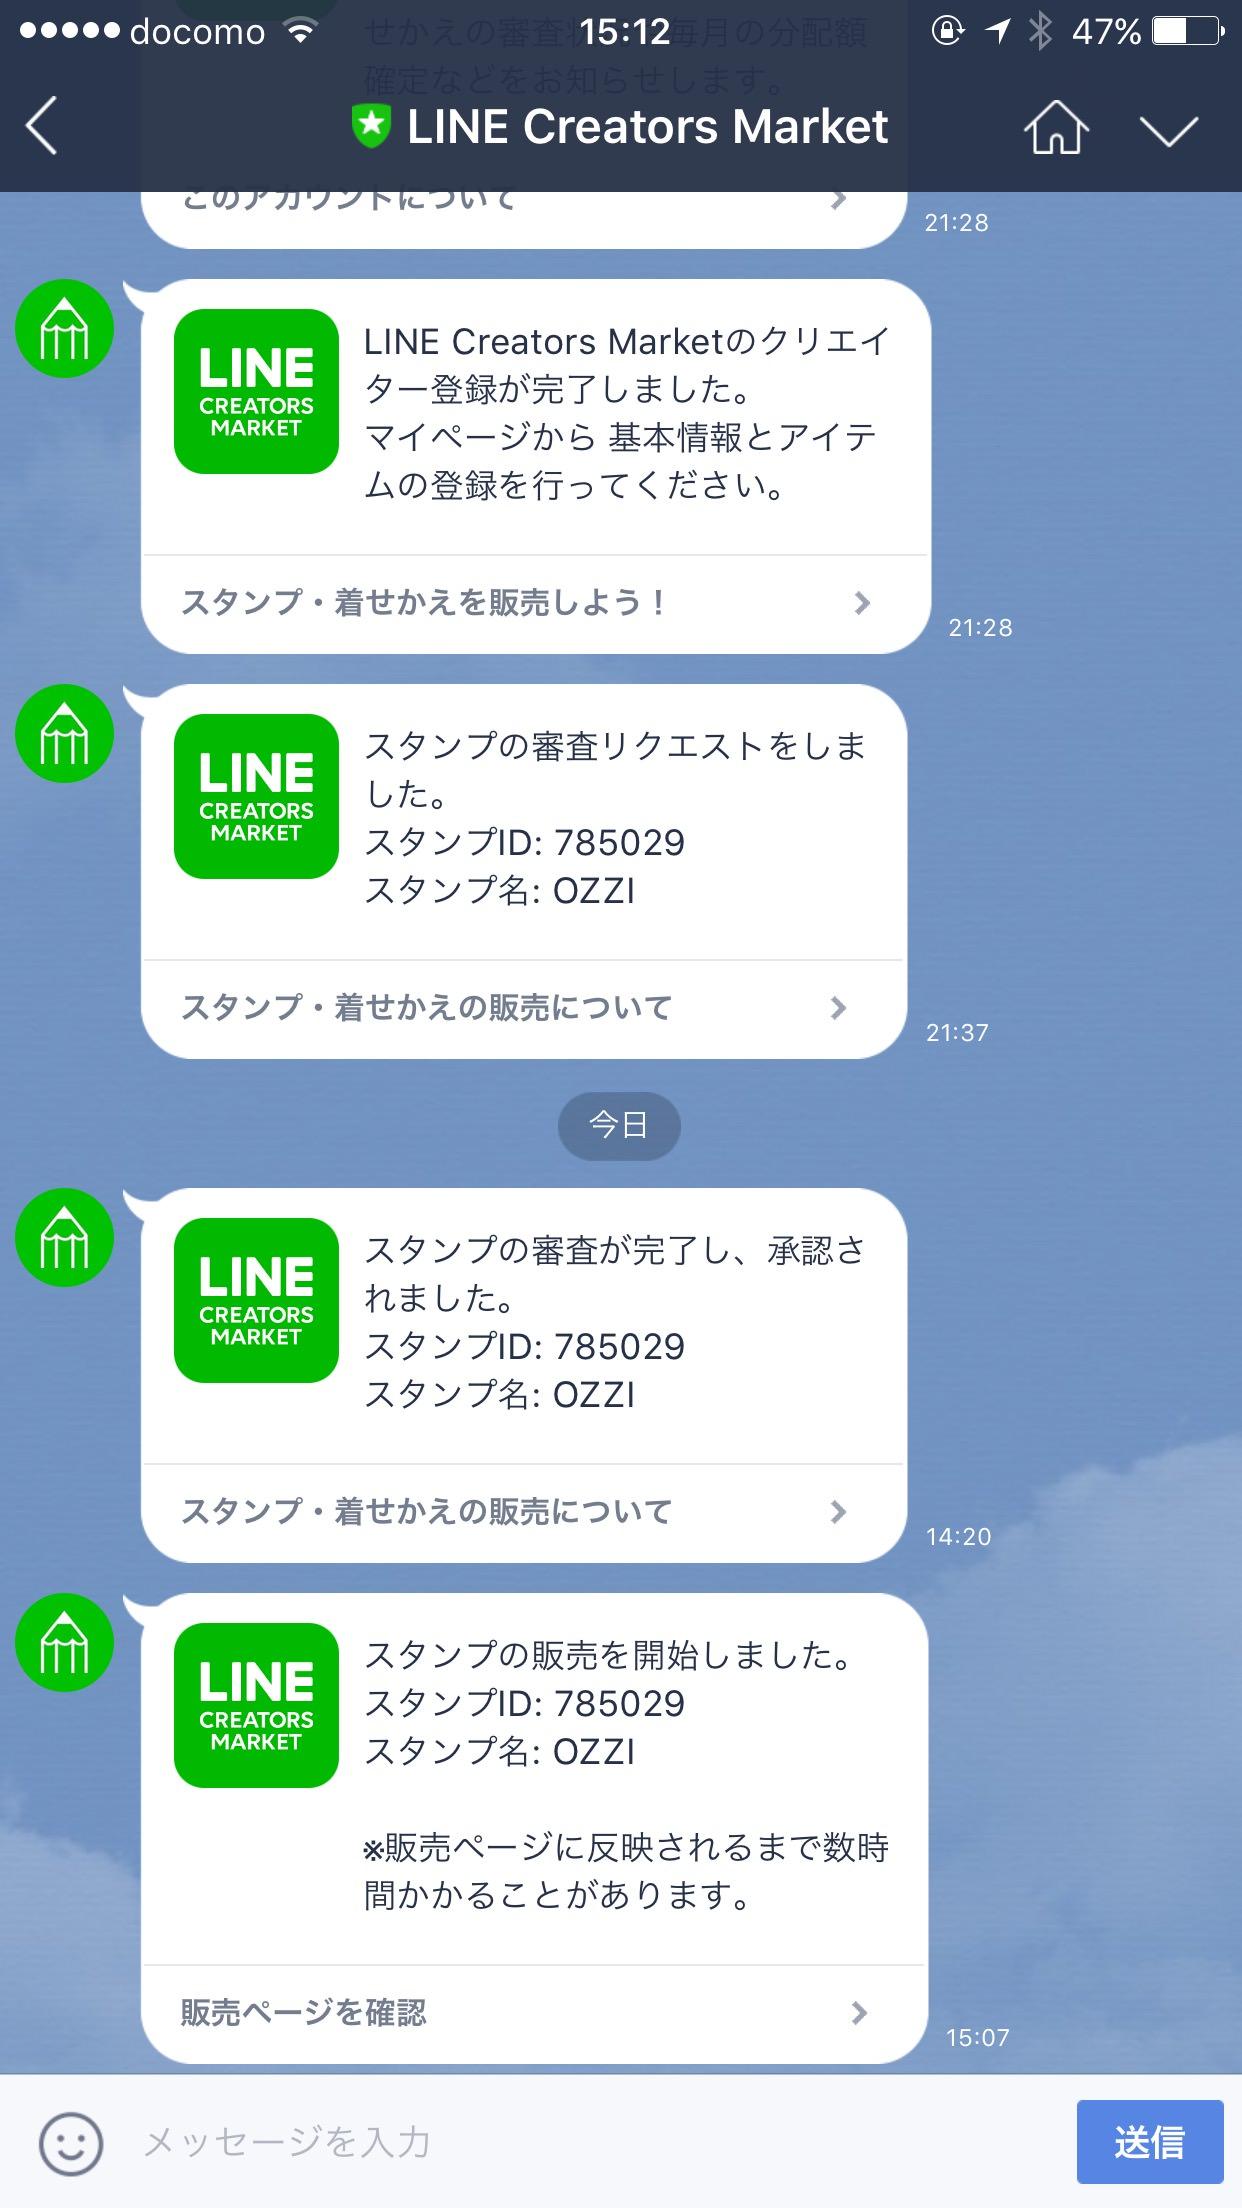 Line creators stamp 5593